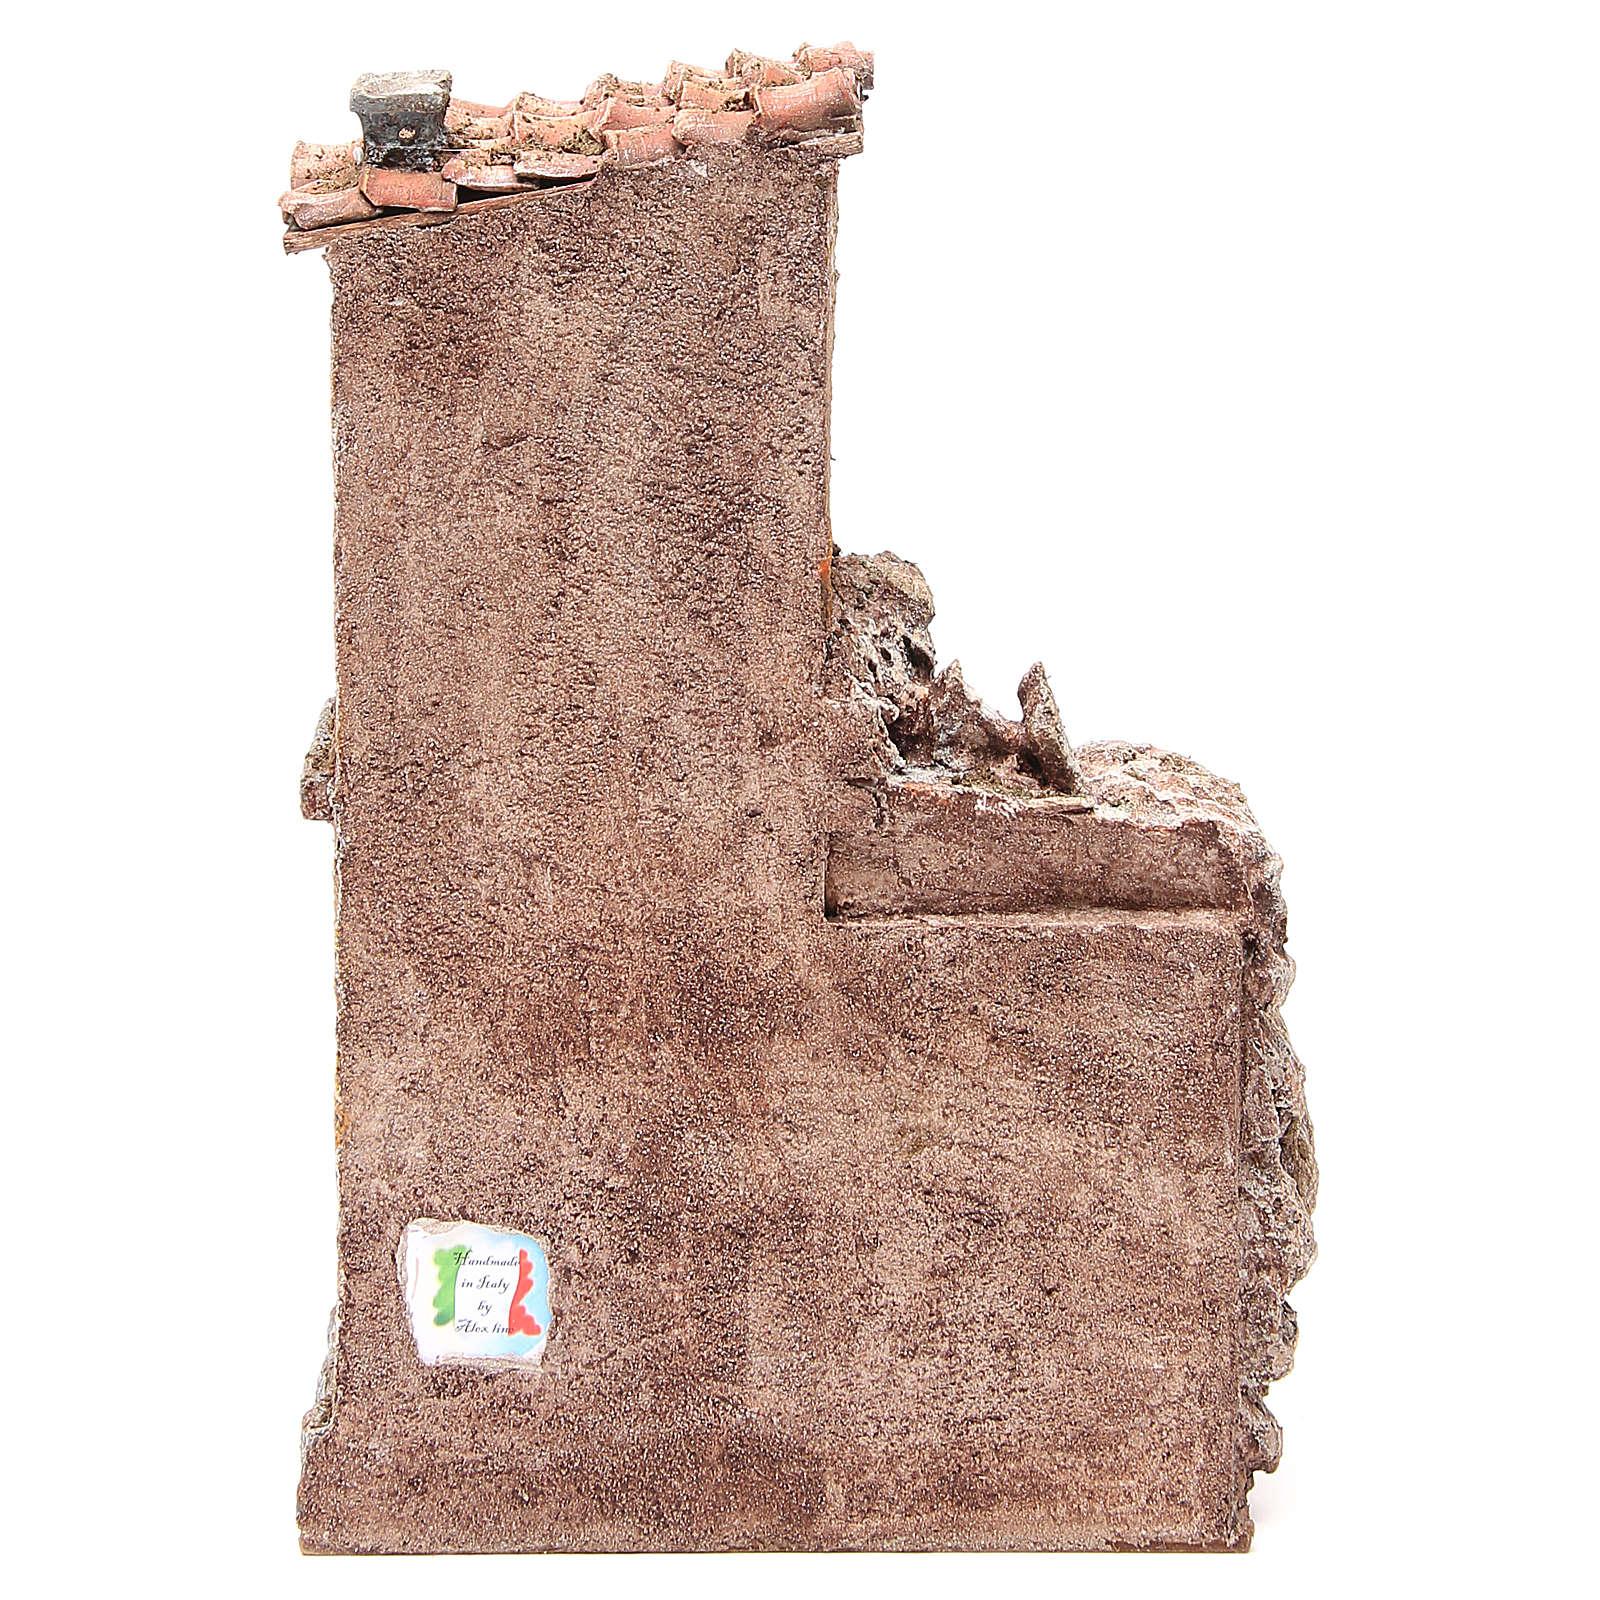 Casa con capanna rustica presepe 30x25x15 cm 4